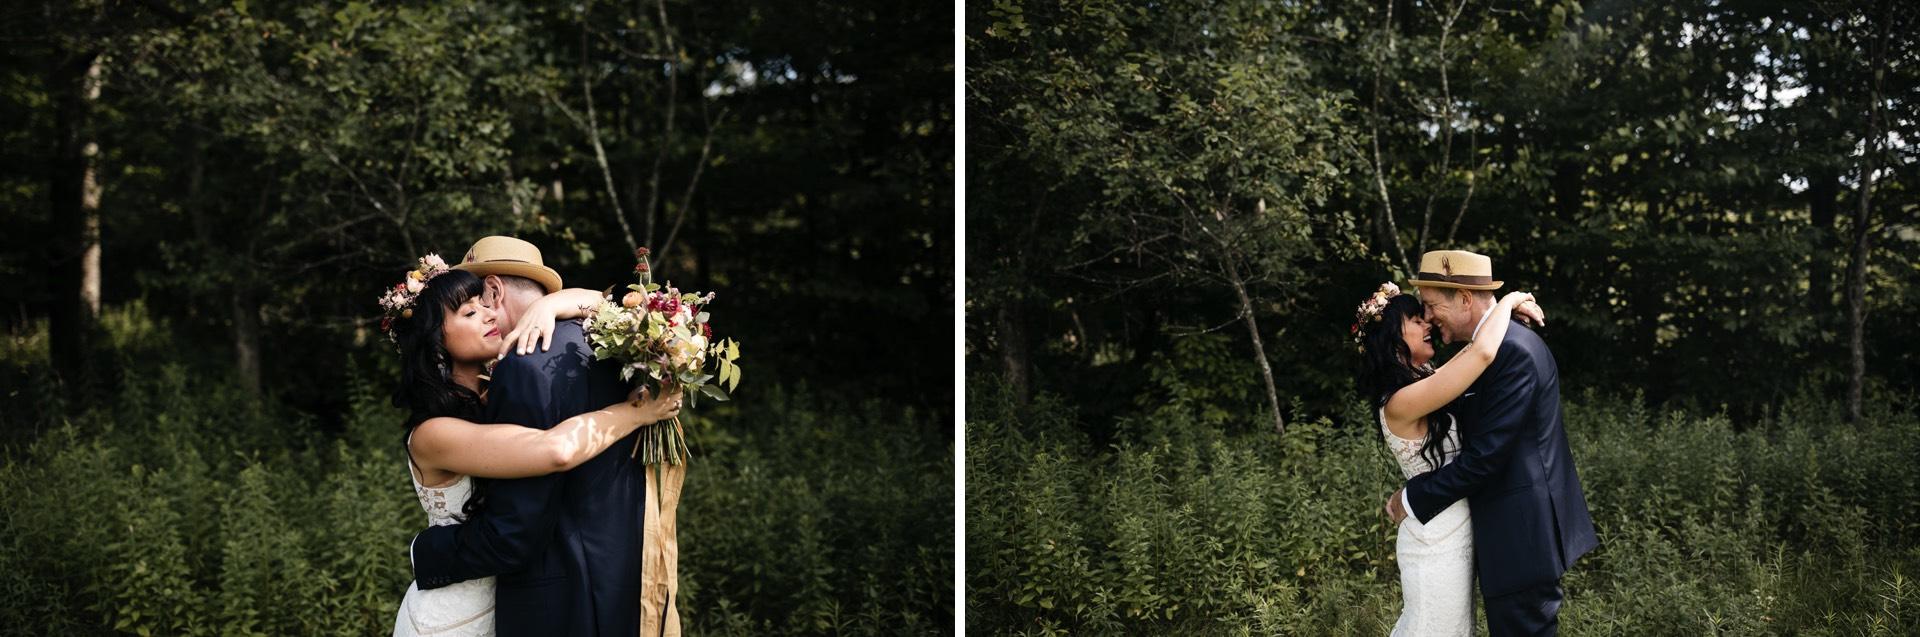 Victoria & Mark Wedding Handsome Hollow, Catskills, by Jean-Laurent Gaudy